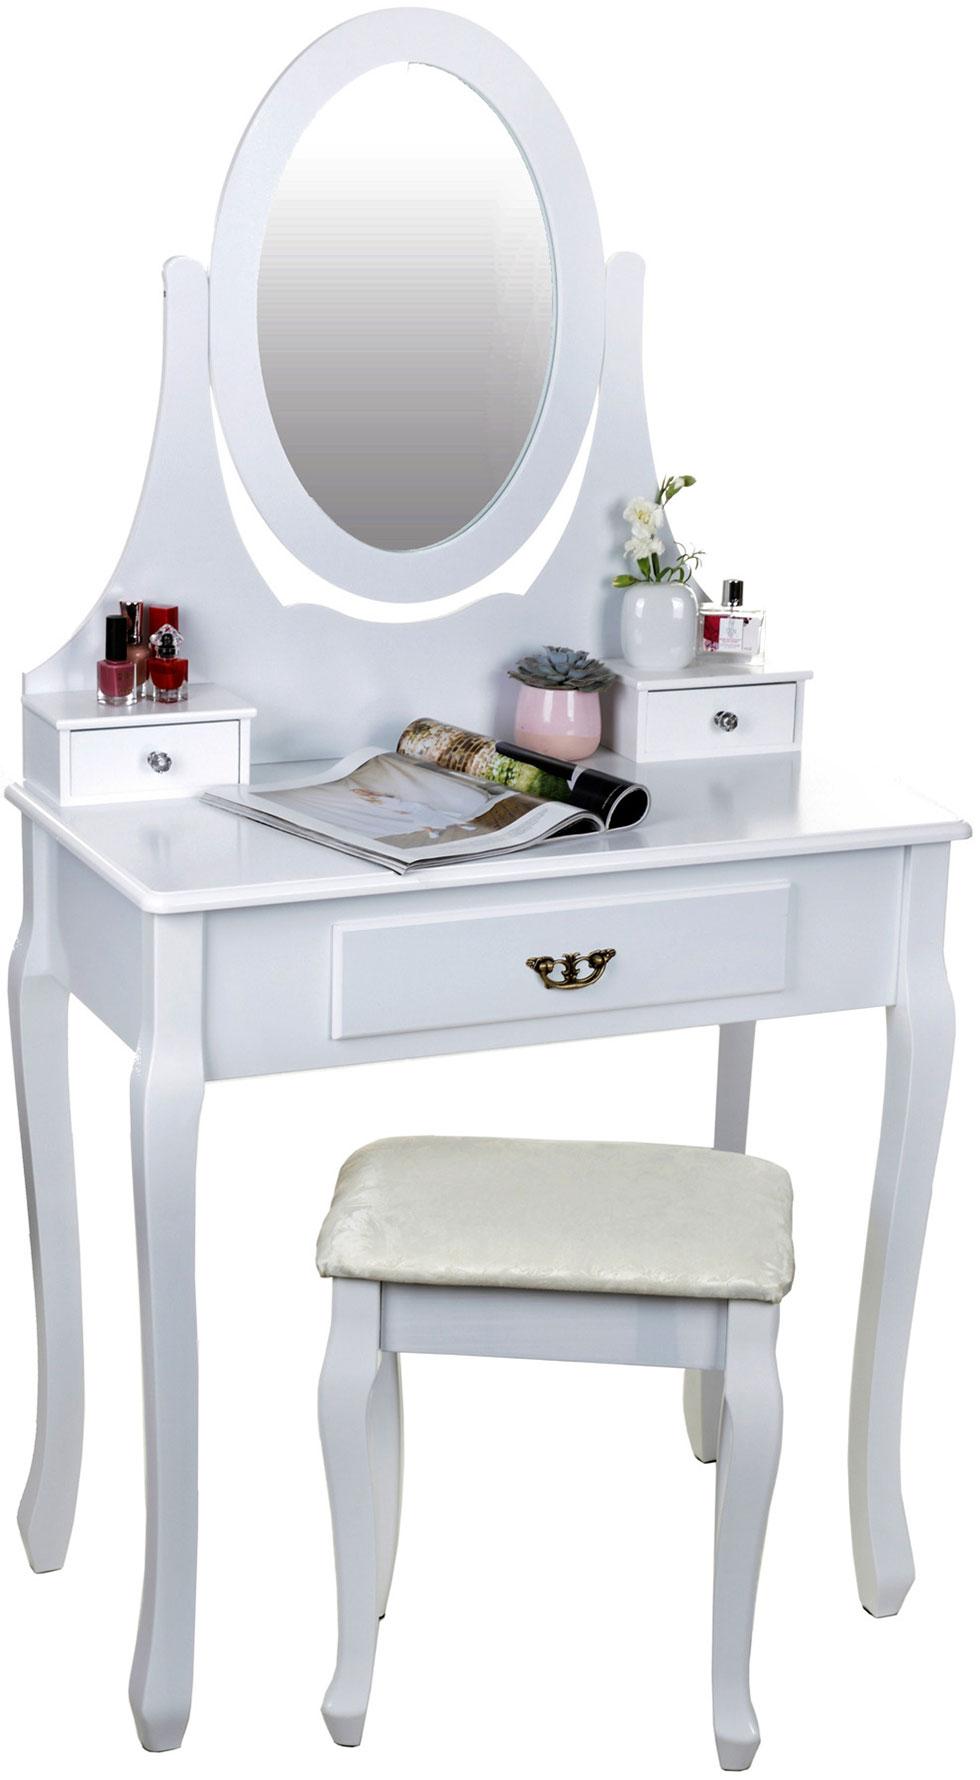 Туалетный столик с зеркалом и табуретом Giosedio